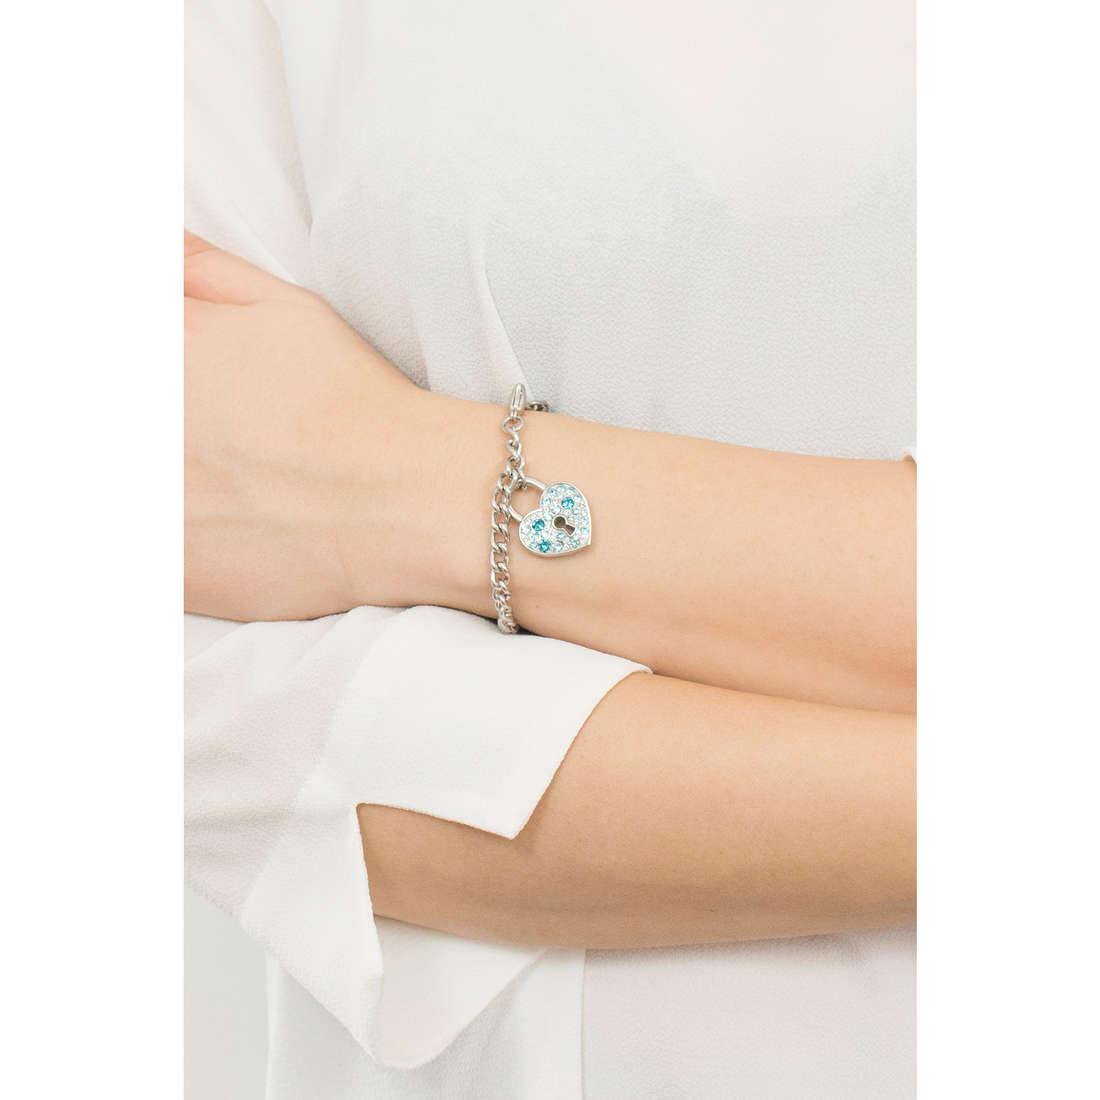 Brosway bracciali Private donna BPV15 indosso